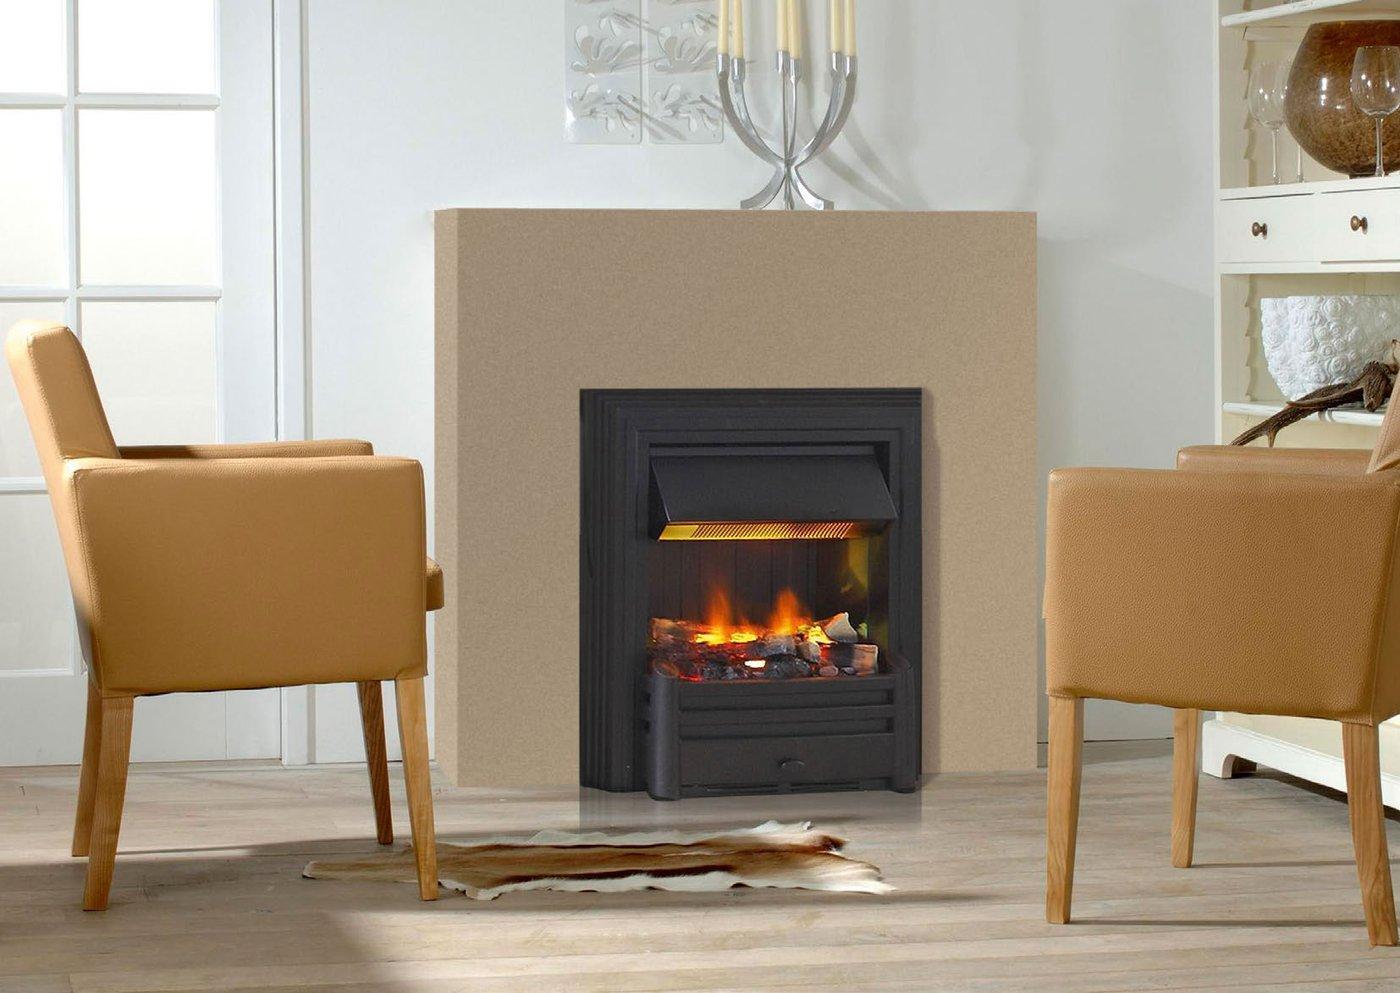 beratung h ufige fragen antworten design heating. Black Bedroom Furniture Sets. Home Design Ideas